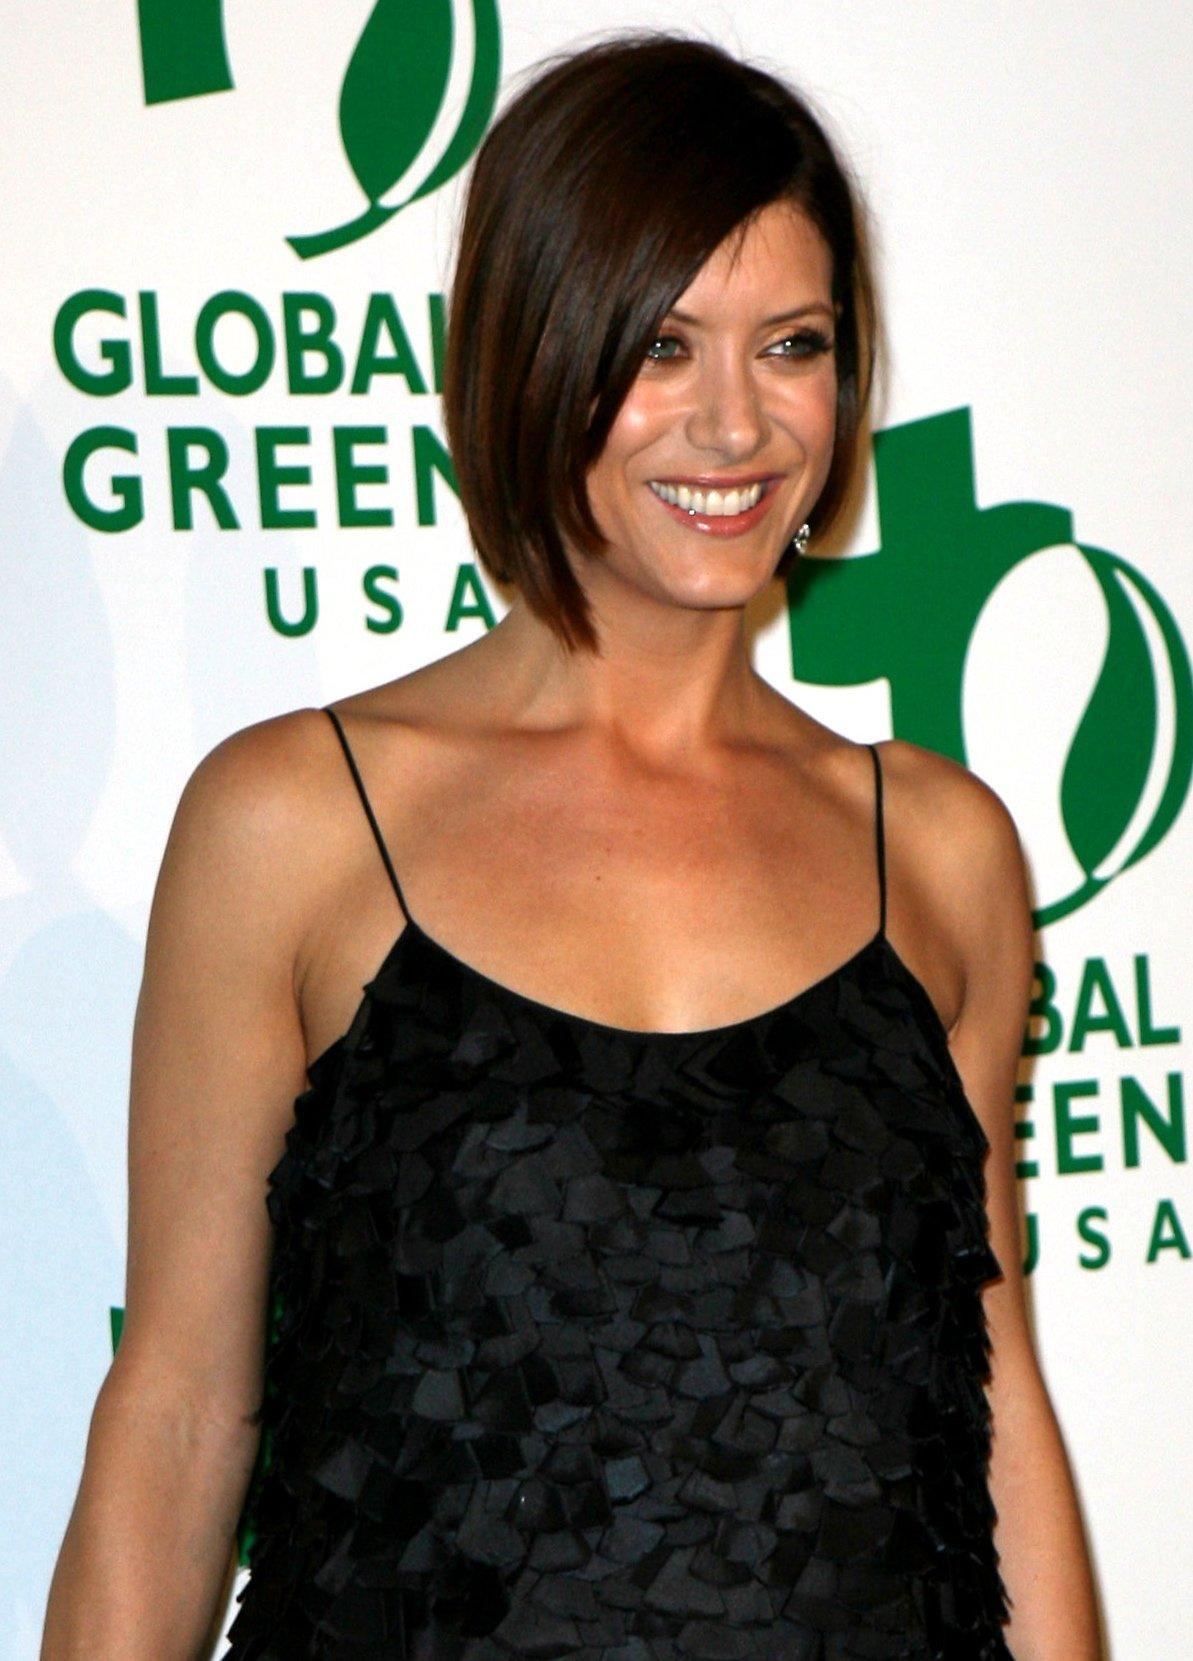 53627_Celebutopia-Kate_Walsh-Global_Green_Pre-Oscar_Party-02_122_620lo.JPG